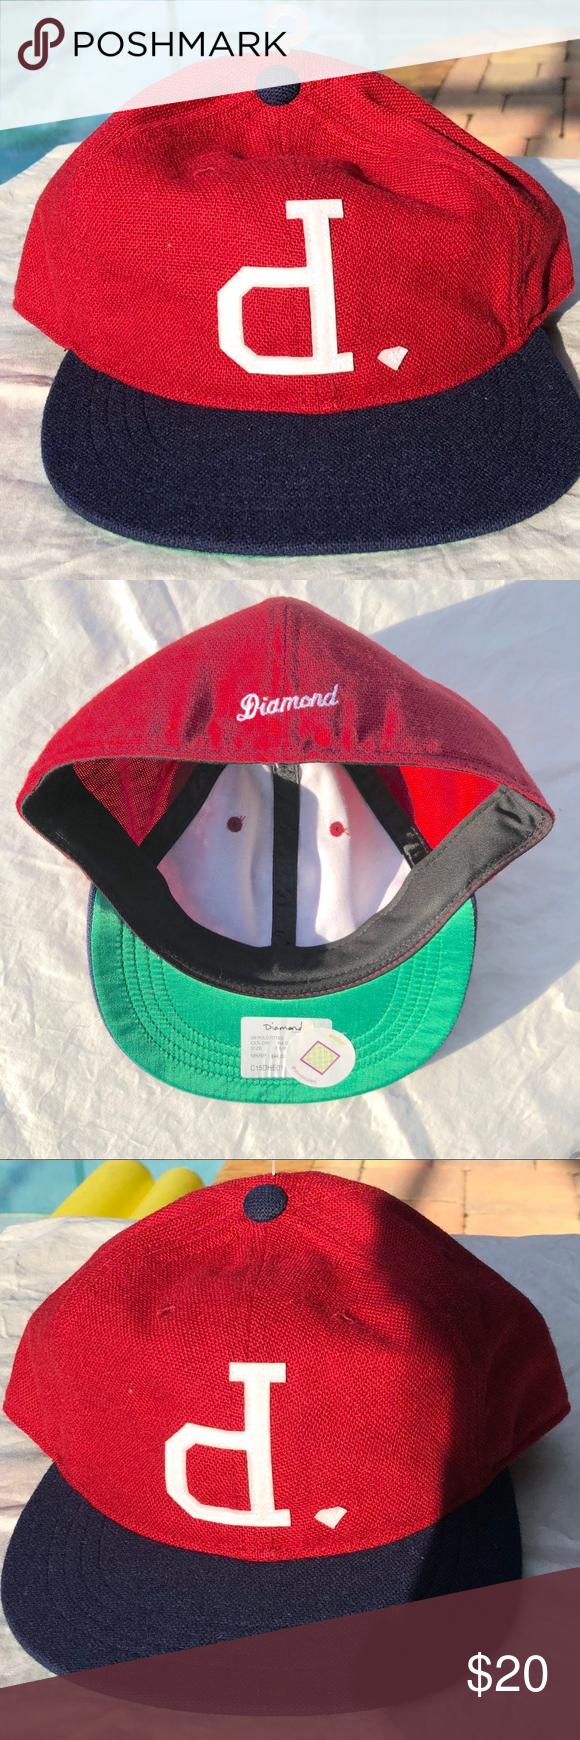 "Diamond ""P"" Baseball Cap NWT Red & Blue Diamond Baseball"